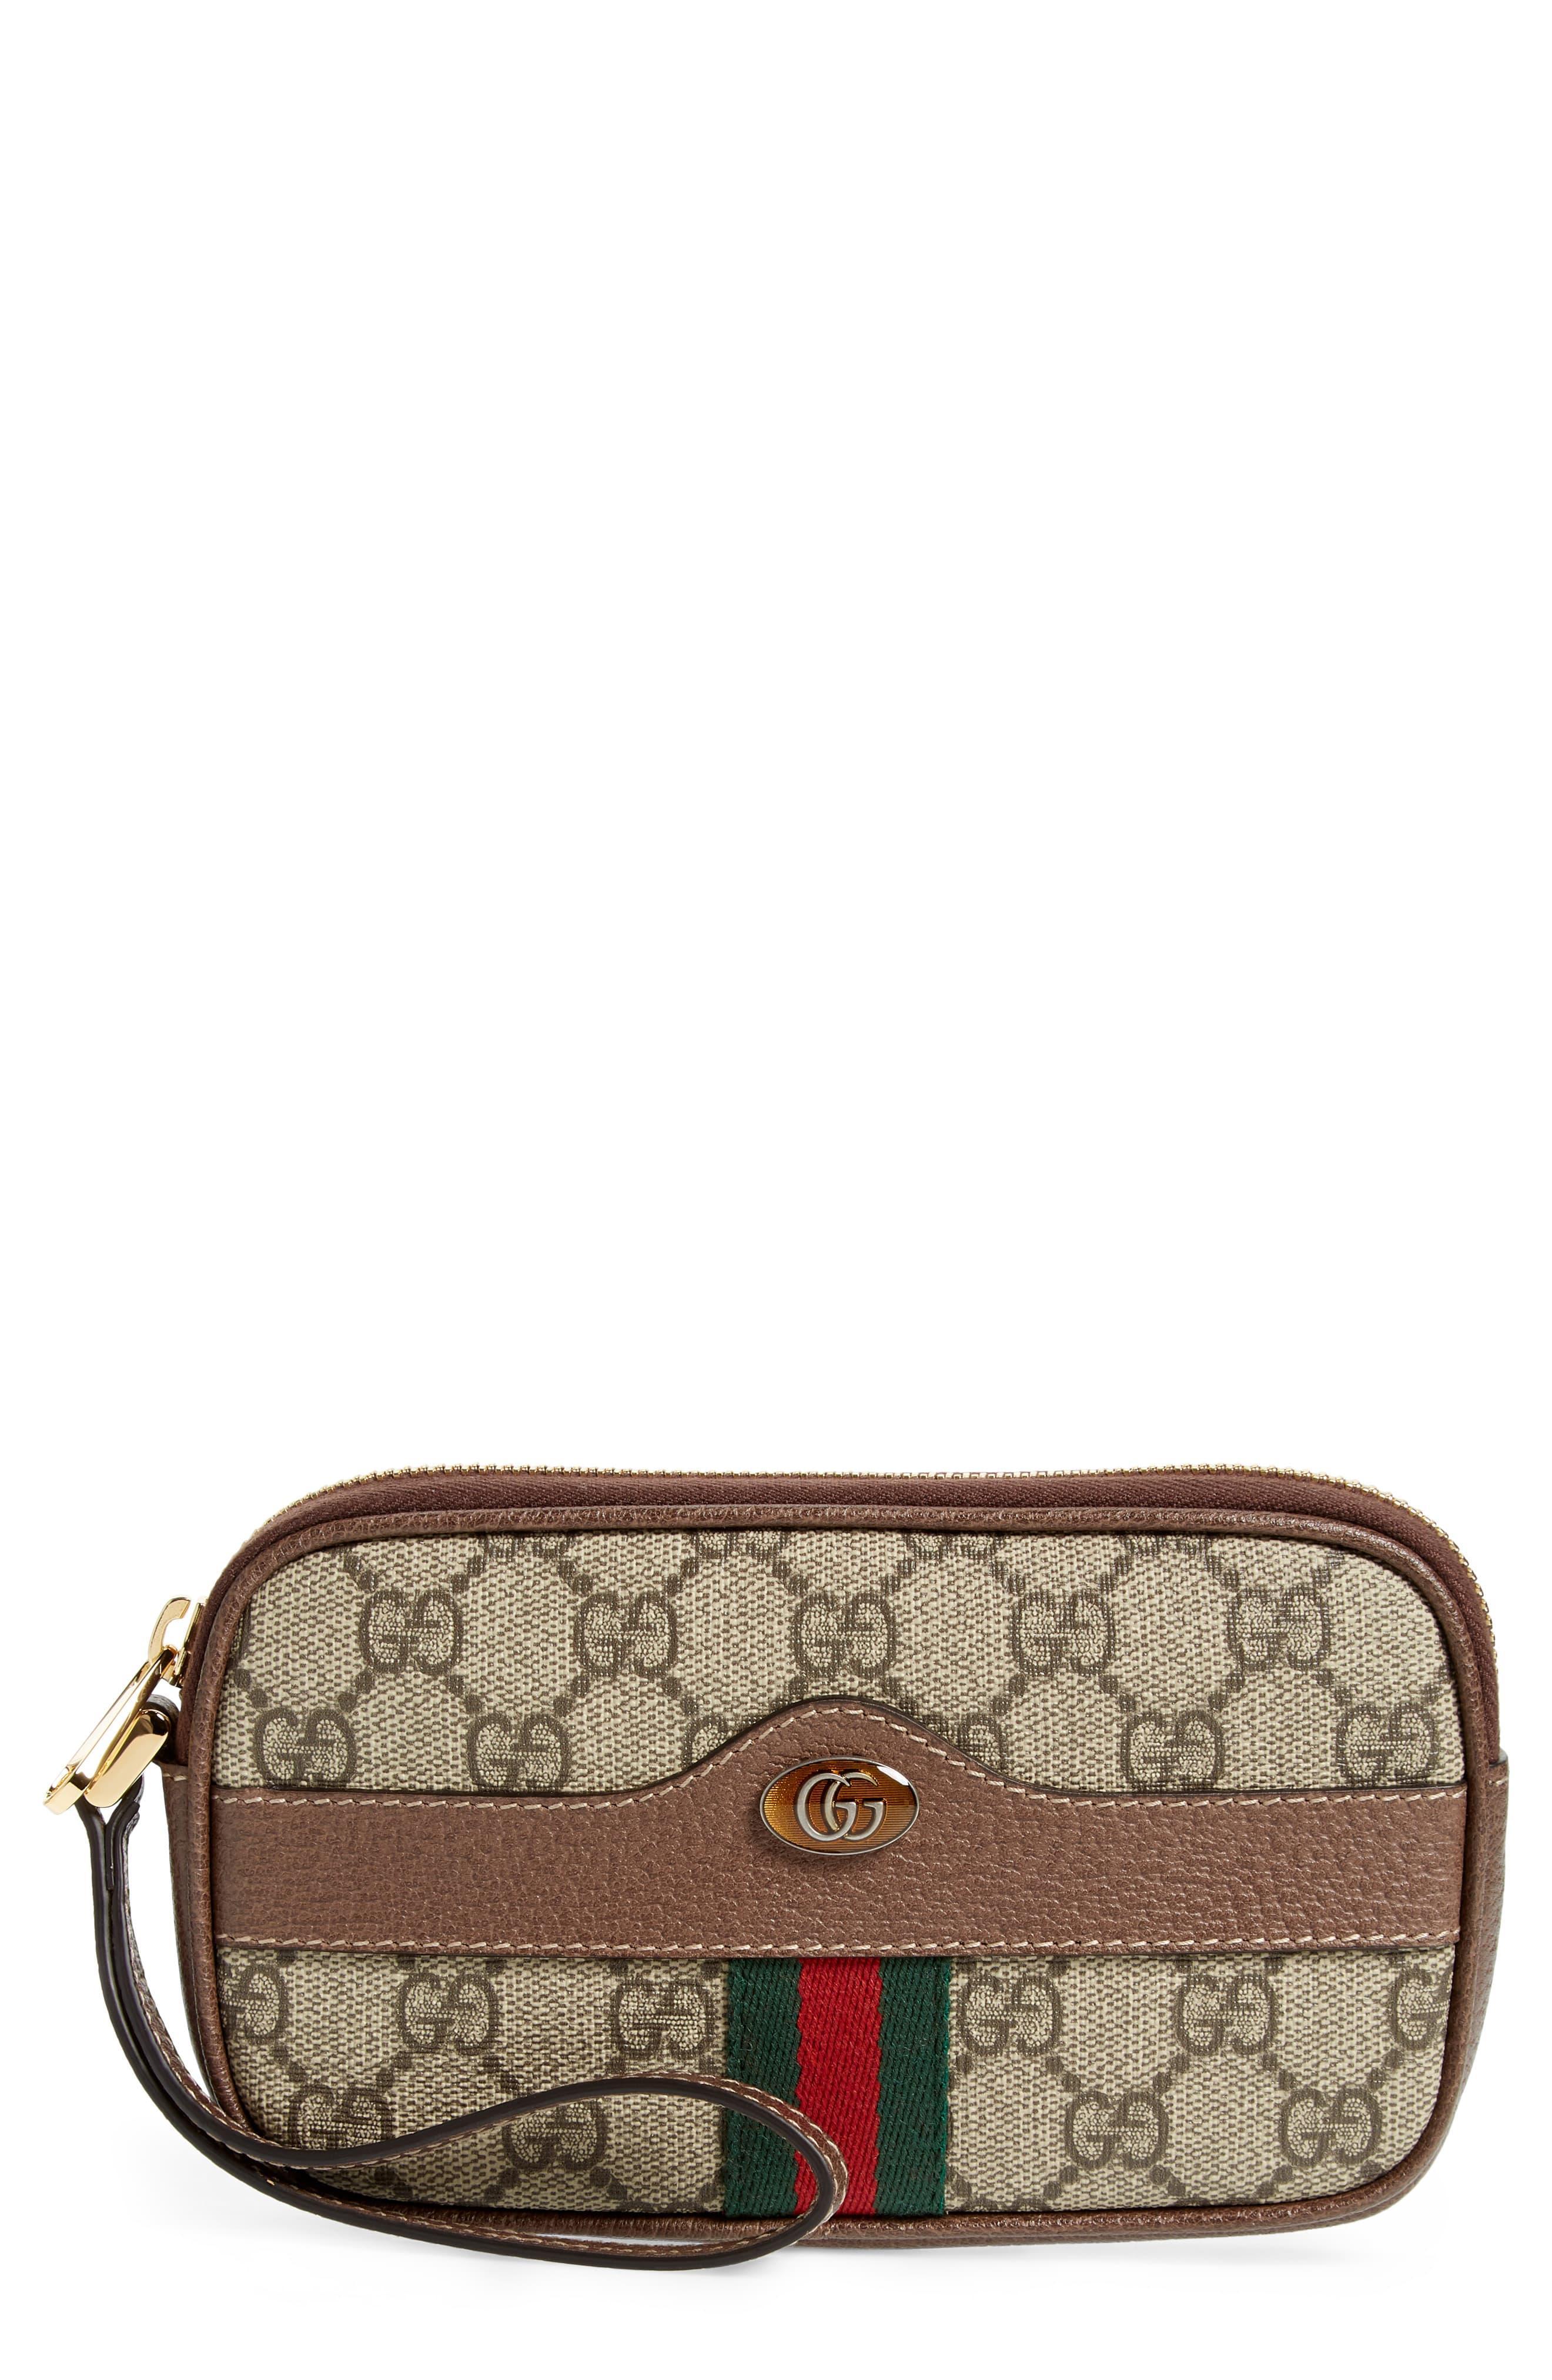 72a4c54090e Gucci - Natural Ophidia Gg Supreme Canvas Wristlet - Lyst. View fullscreen